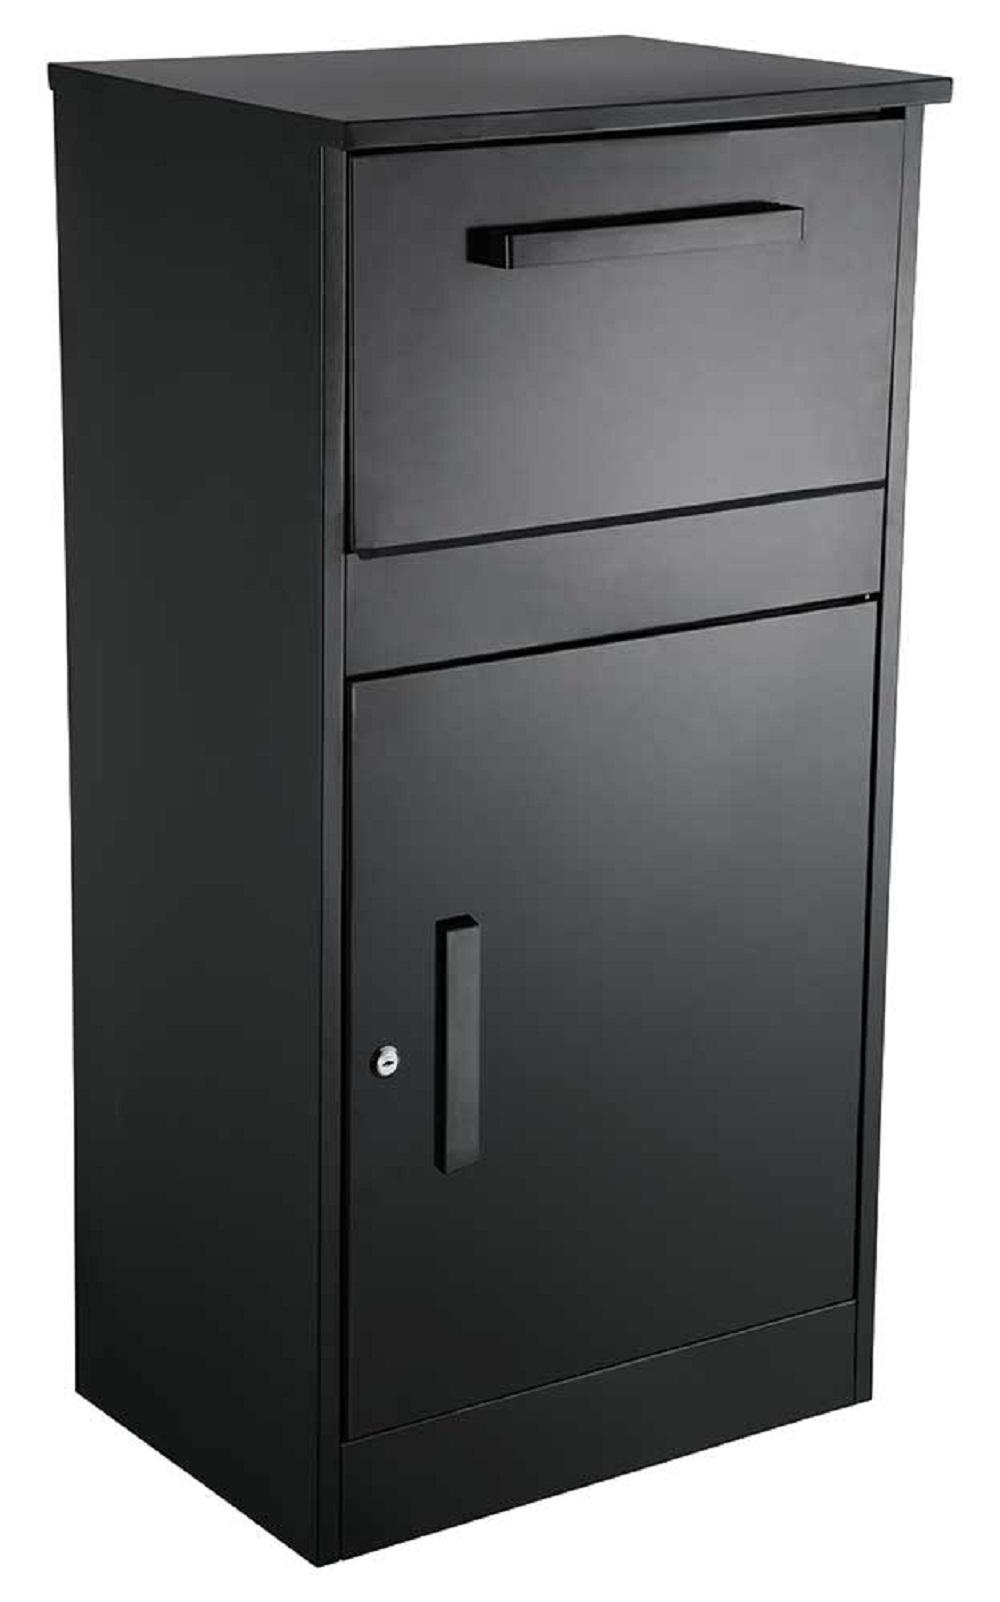 Parcel Defender Locking Dropbox